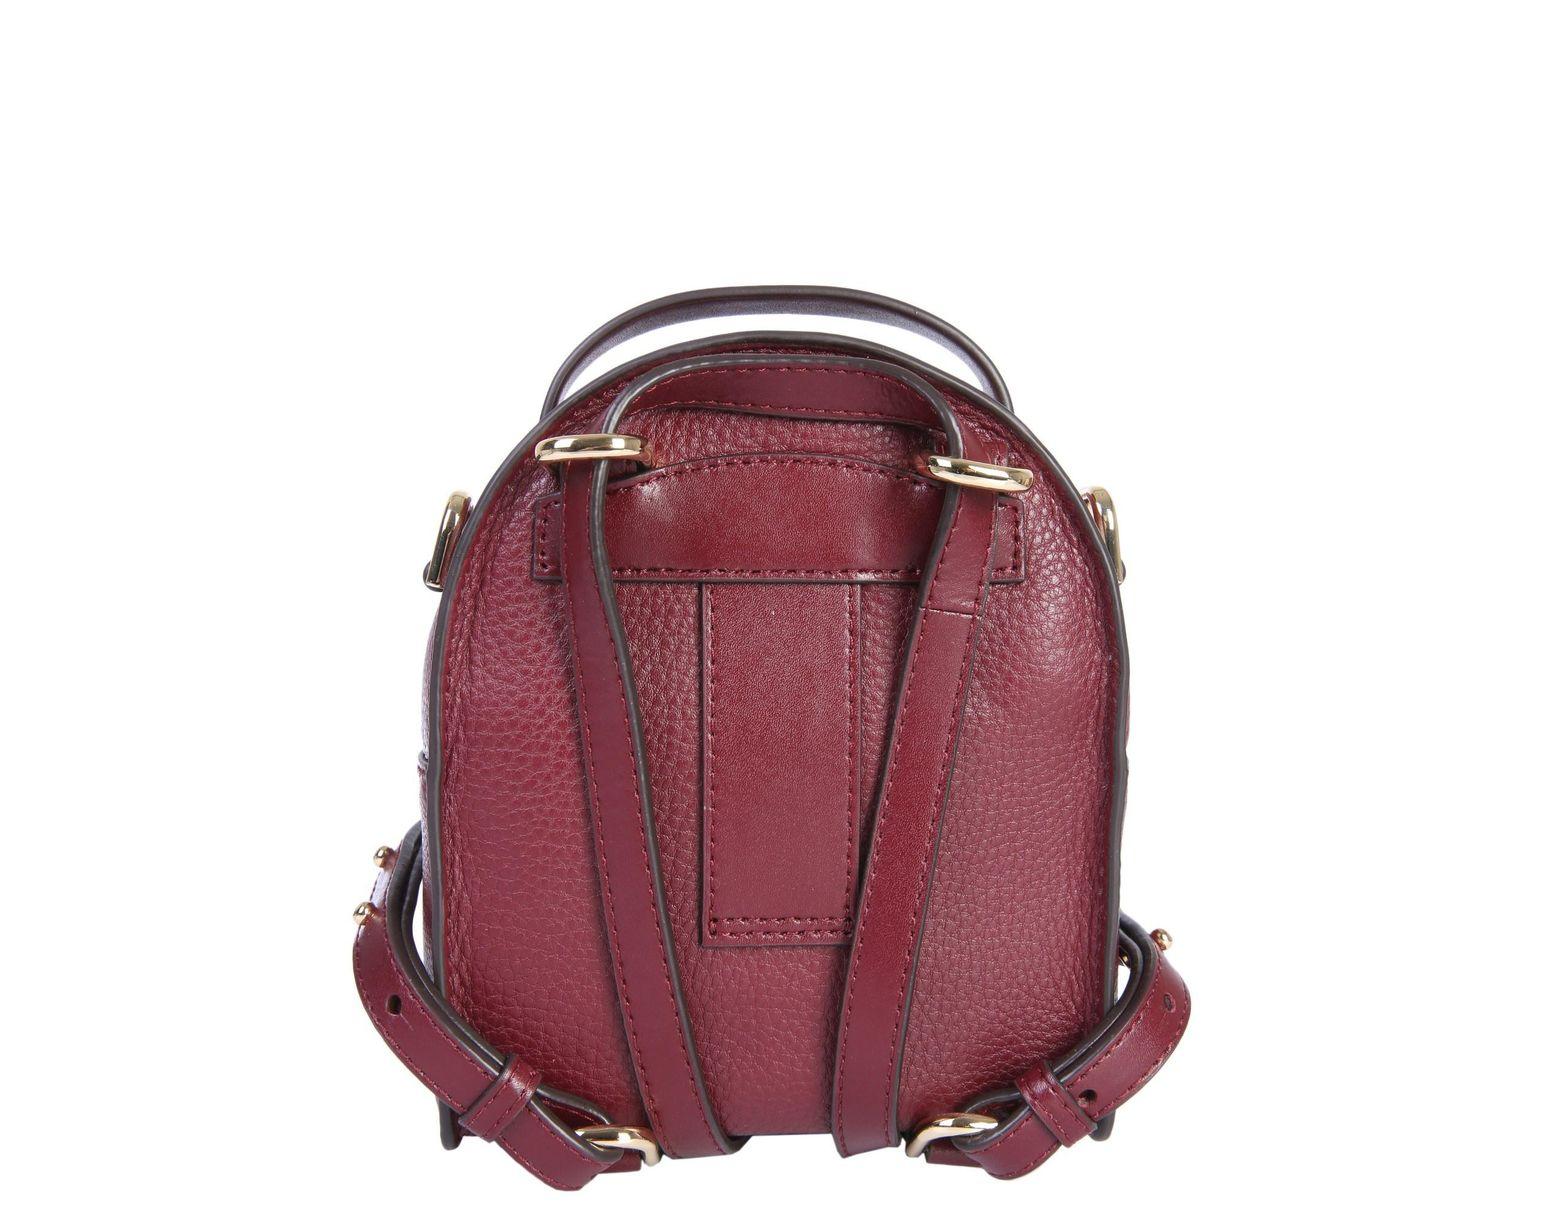 53cbe5cddf00 MICHAEL Michael Kors Mini Jessa Leather Backpack - Lyst